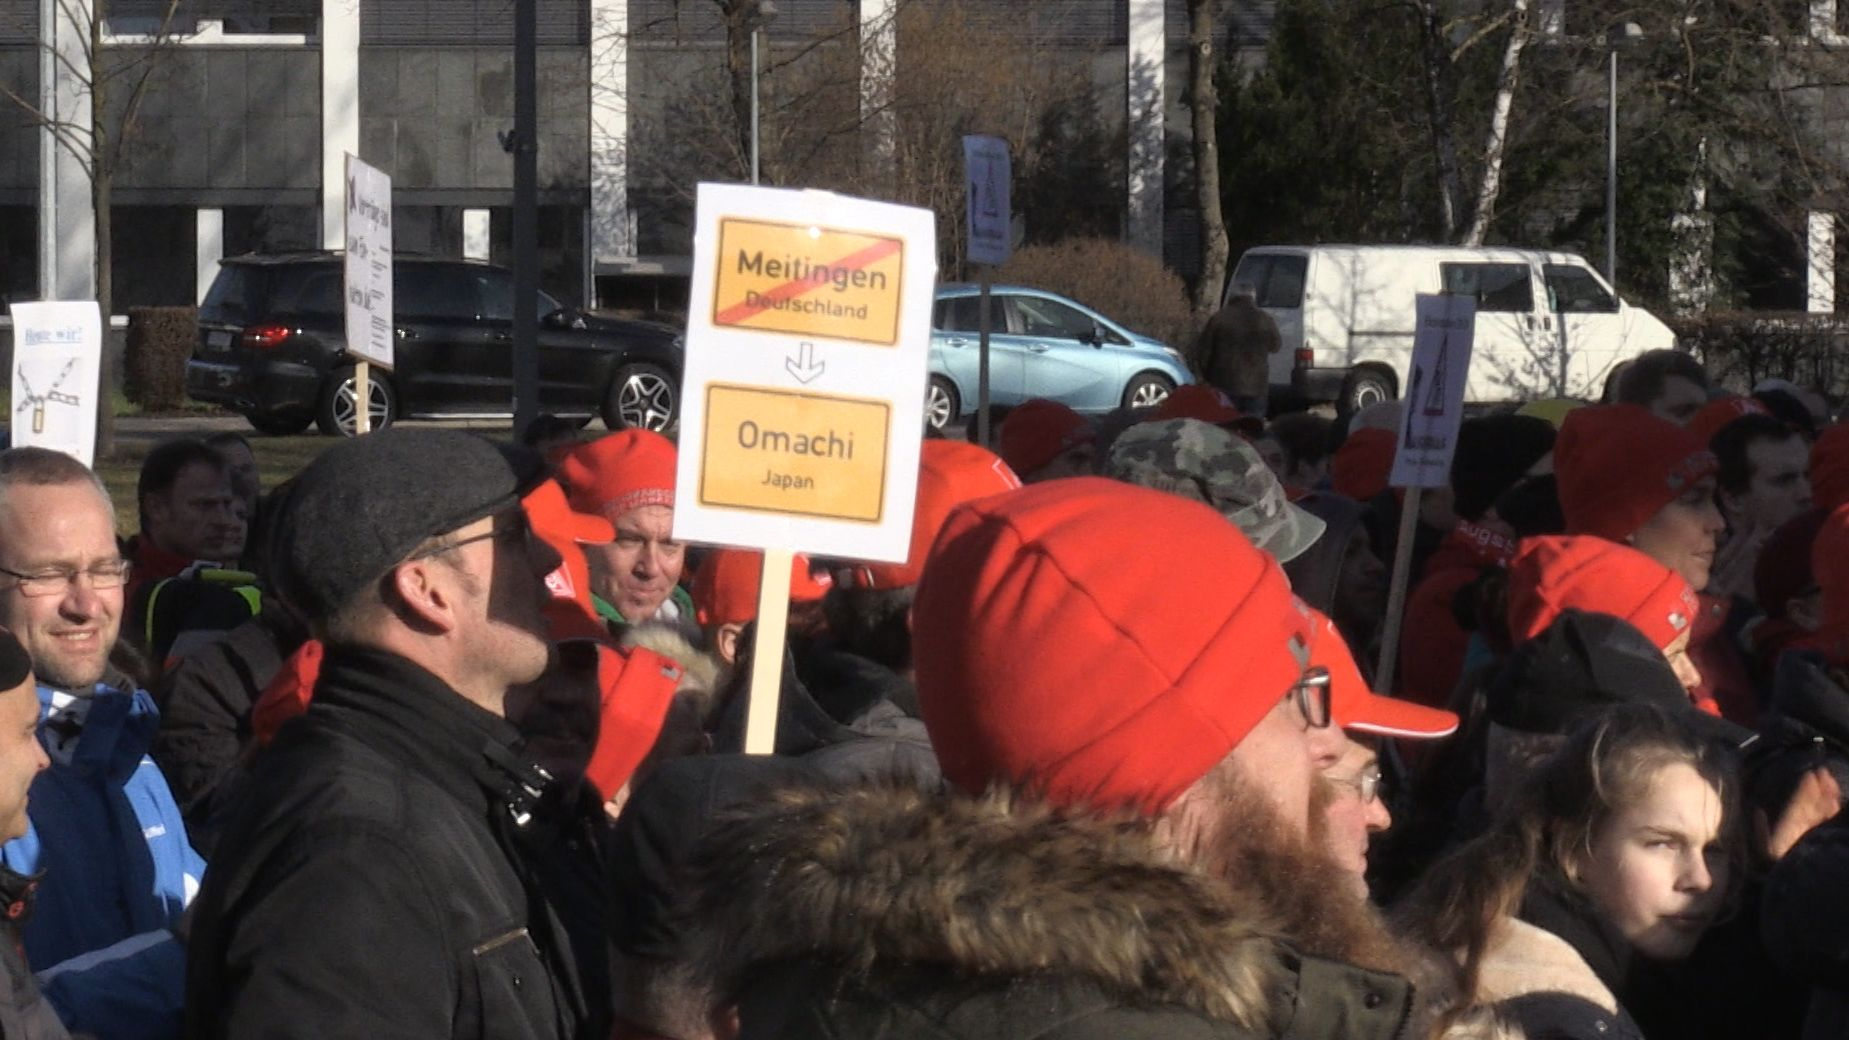 Protestkundgebung bei Showa Denko in Meitingen